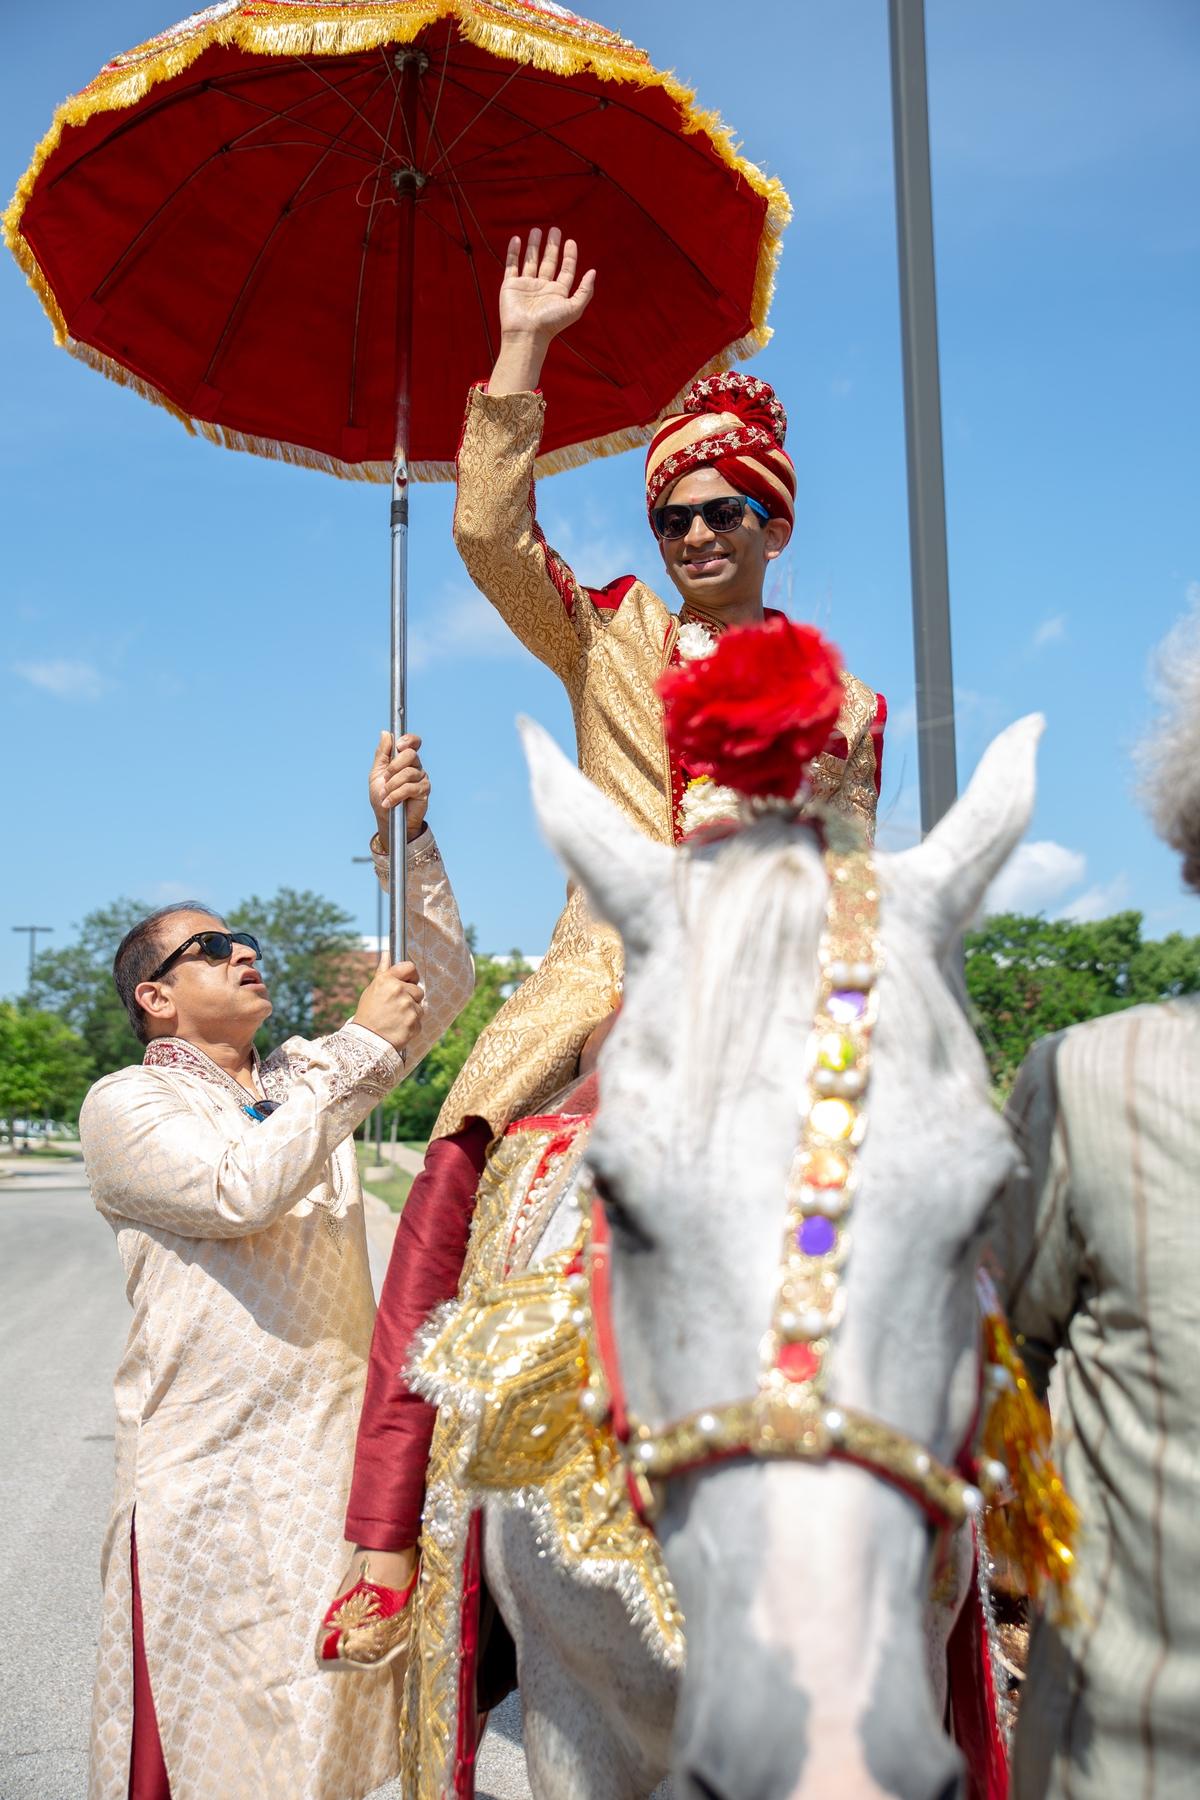 Le Cape Weddings - South Asian Wedding - Chicago Wedding Photographer P&V-50.jpg